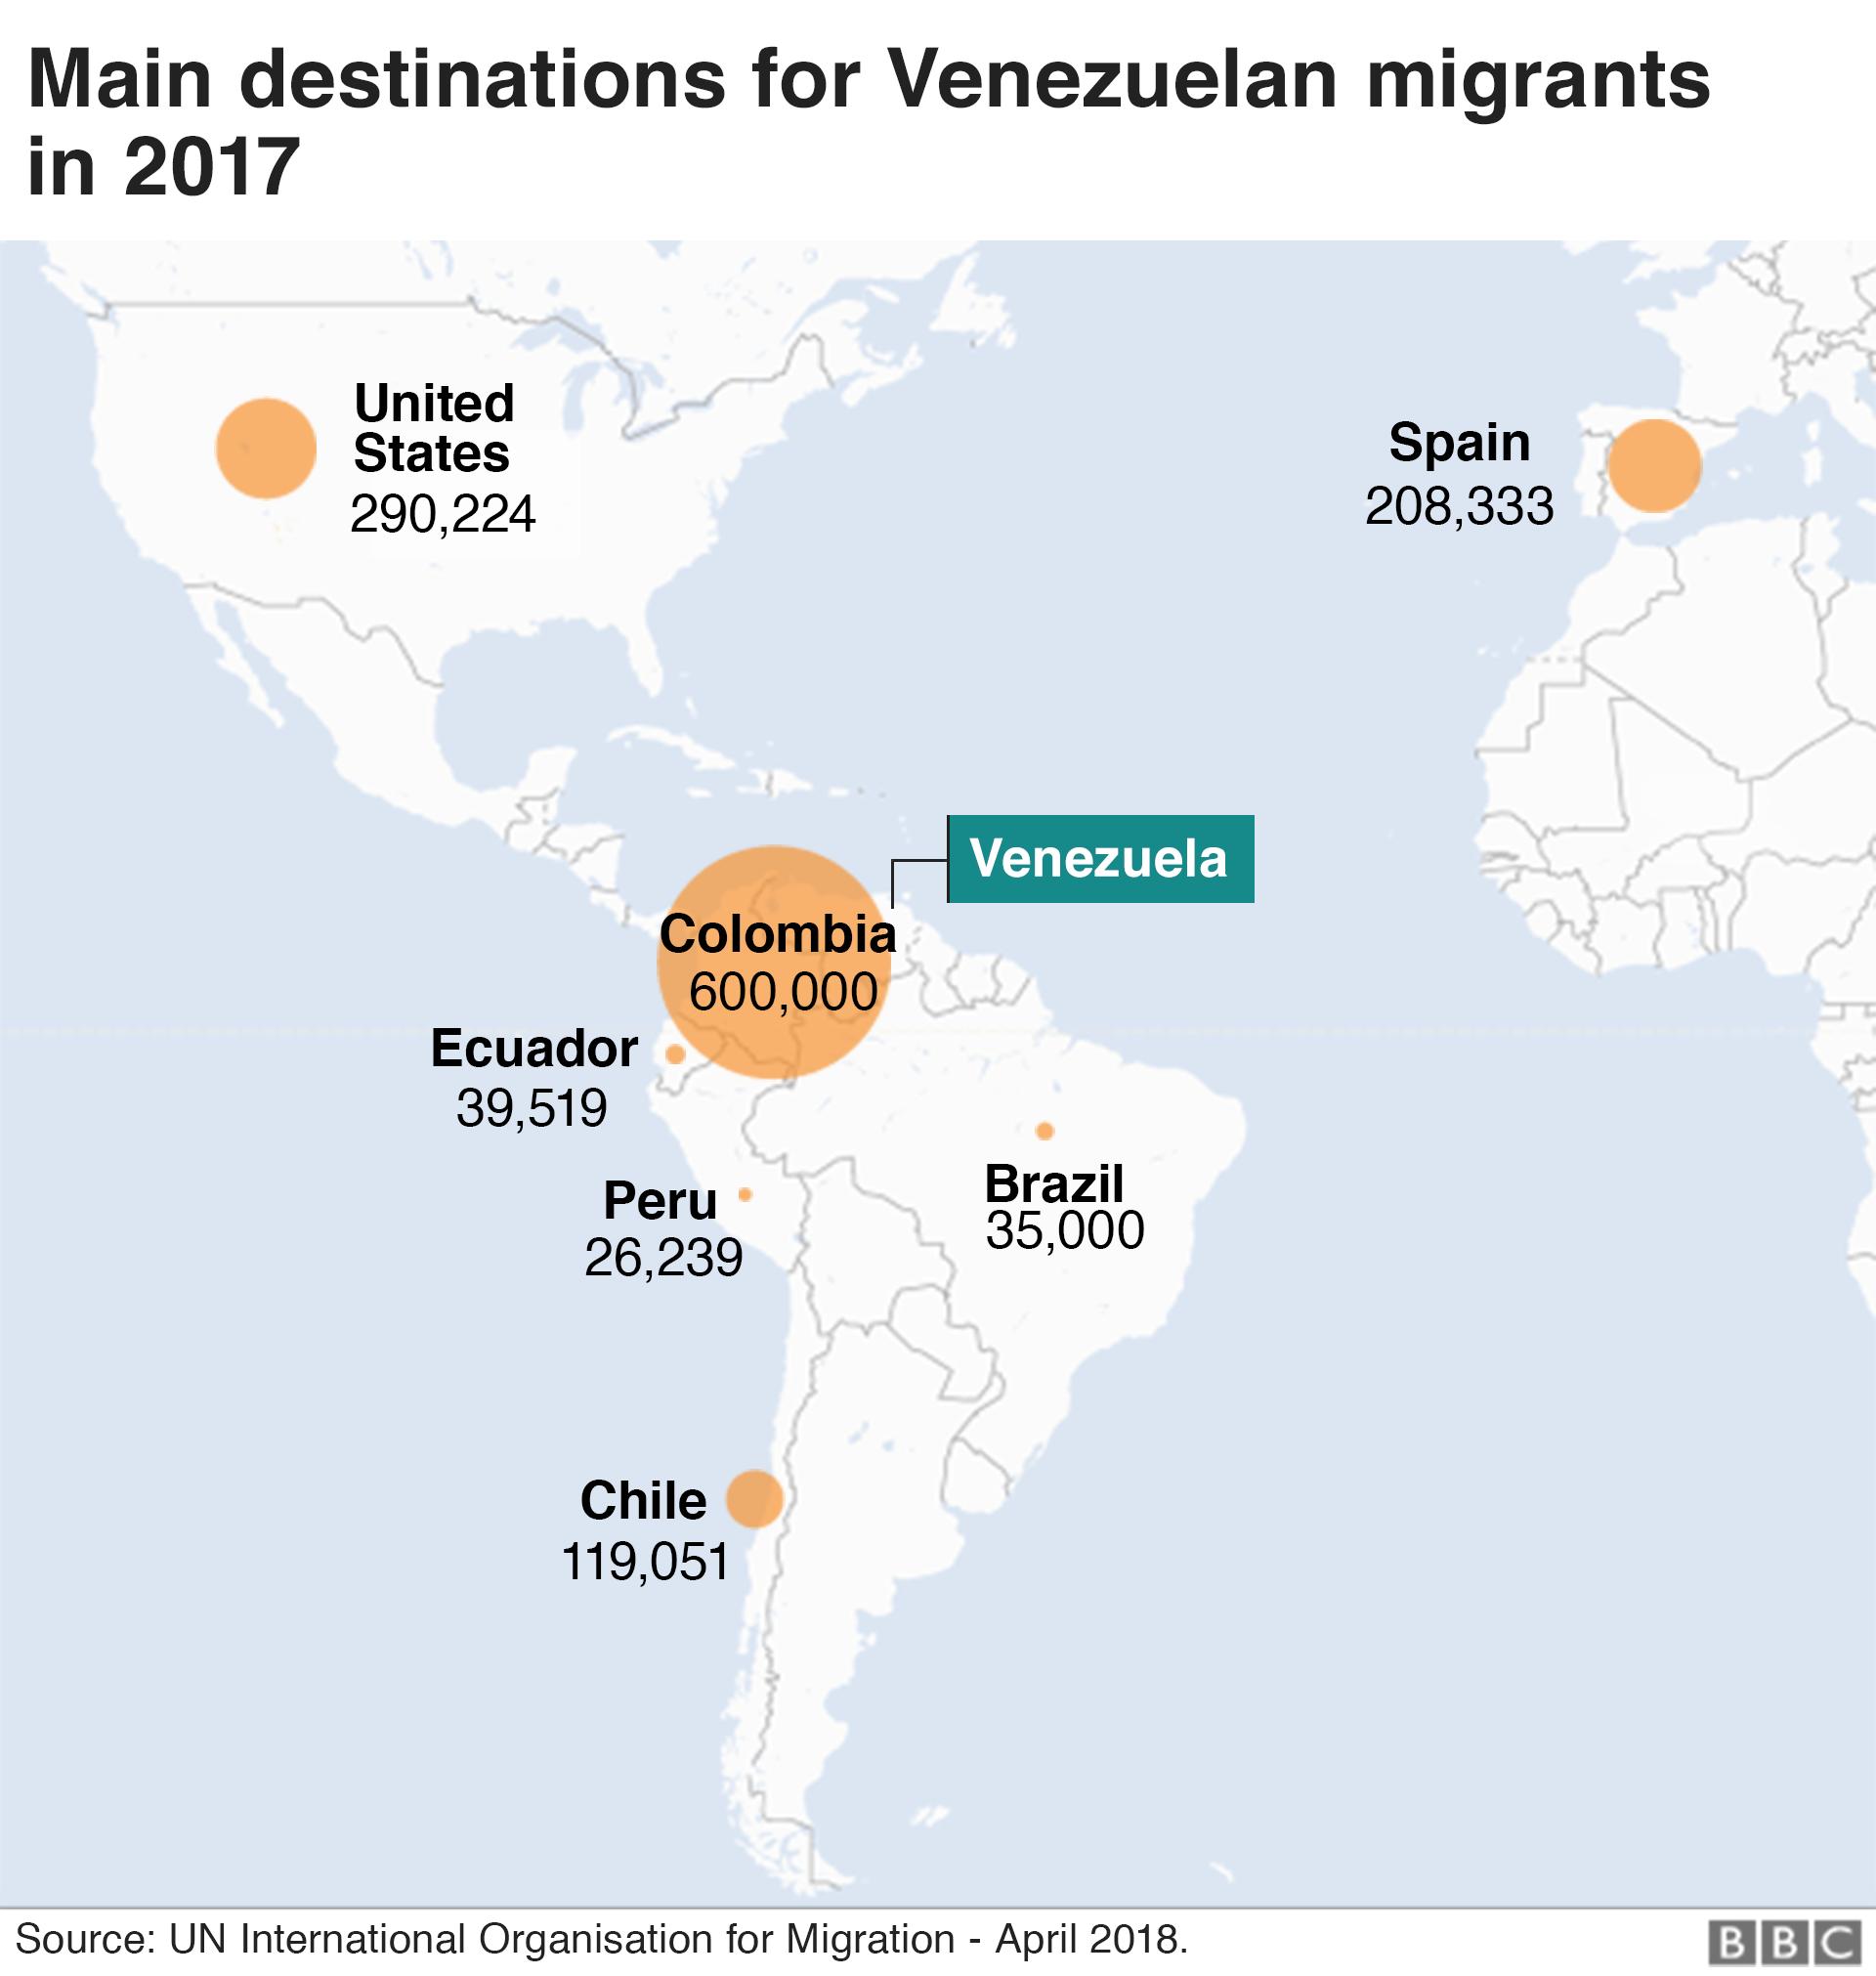 Map of main destinations for Venezuelan migrants